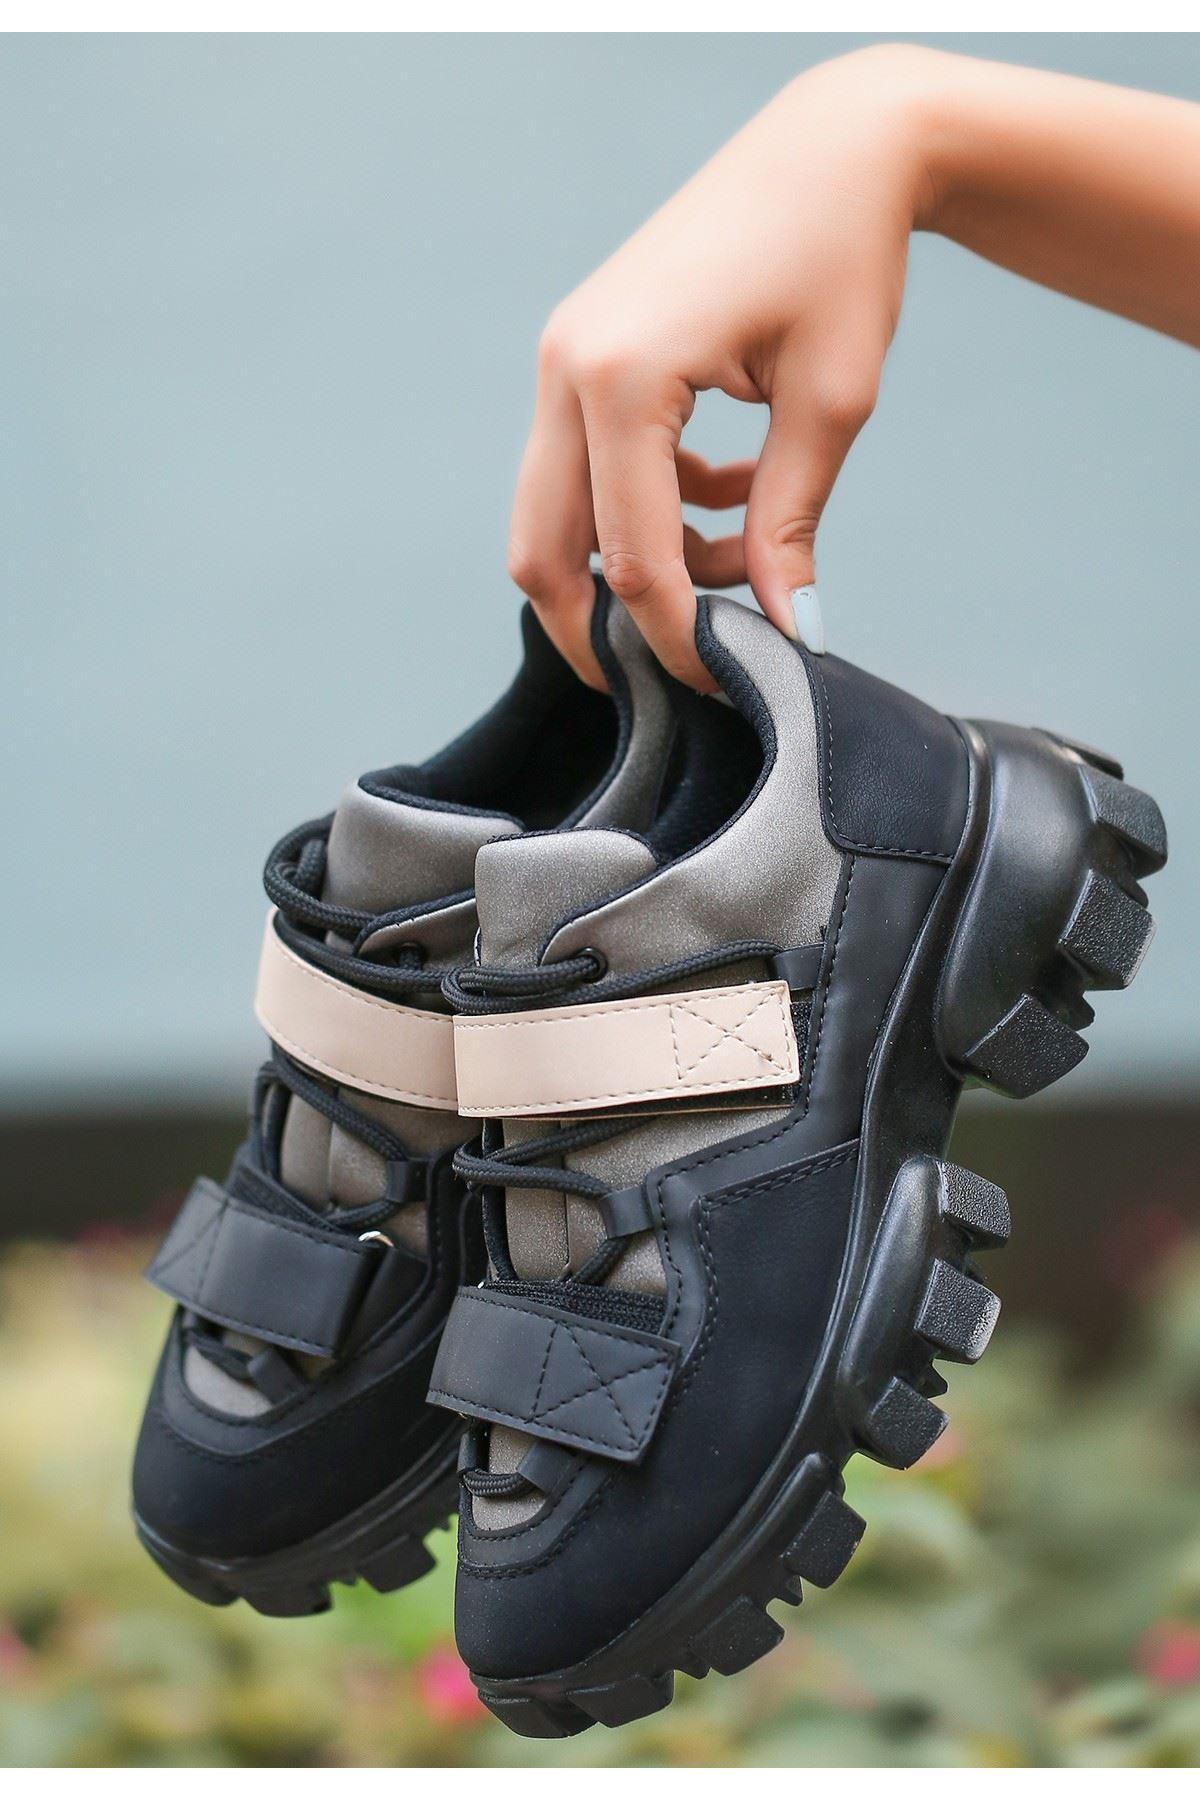 Bend Siyah Nubuk Siyah Detaylı Spor Ayakkabı